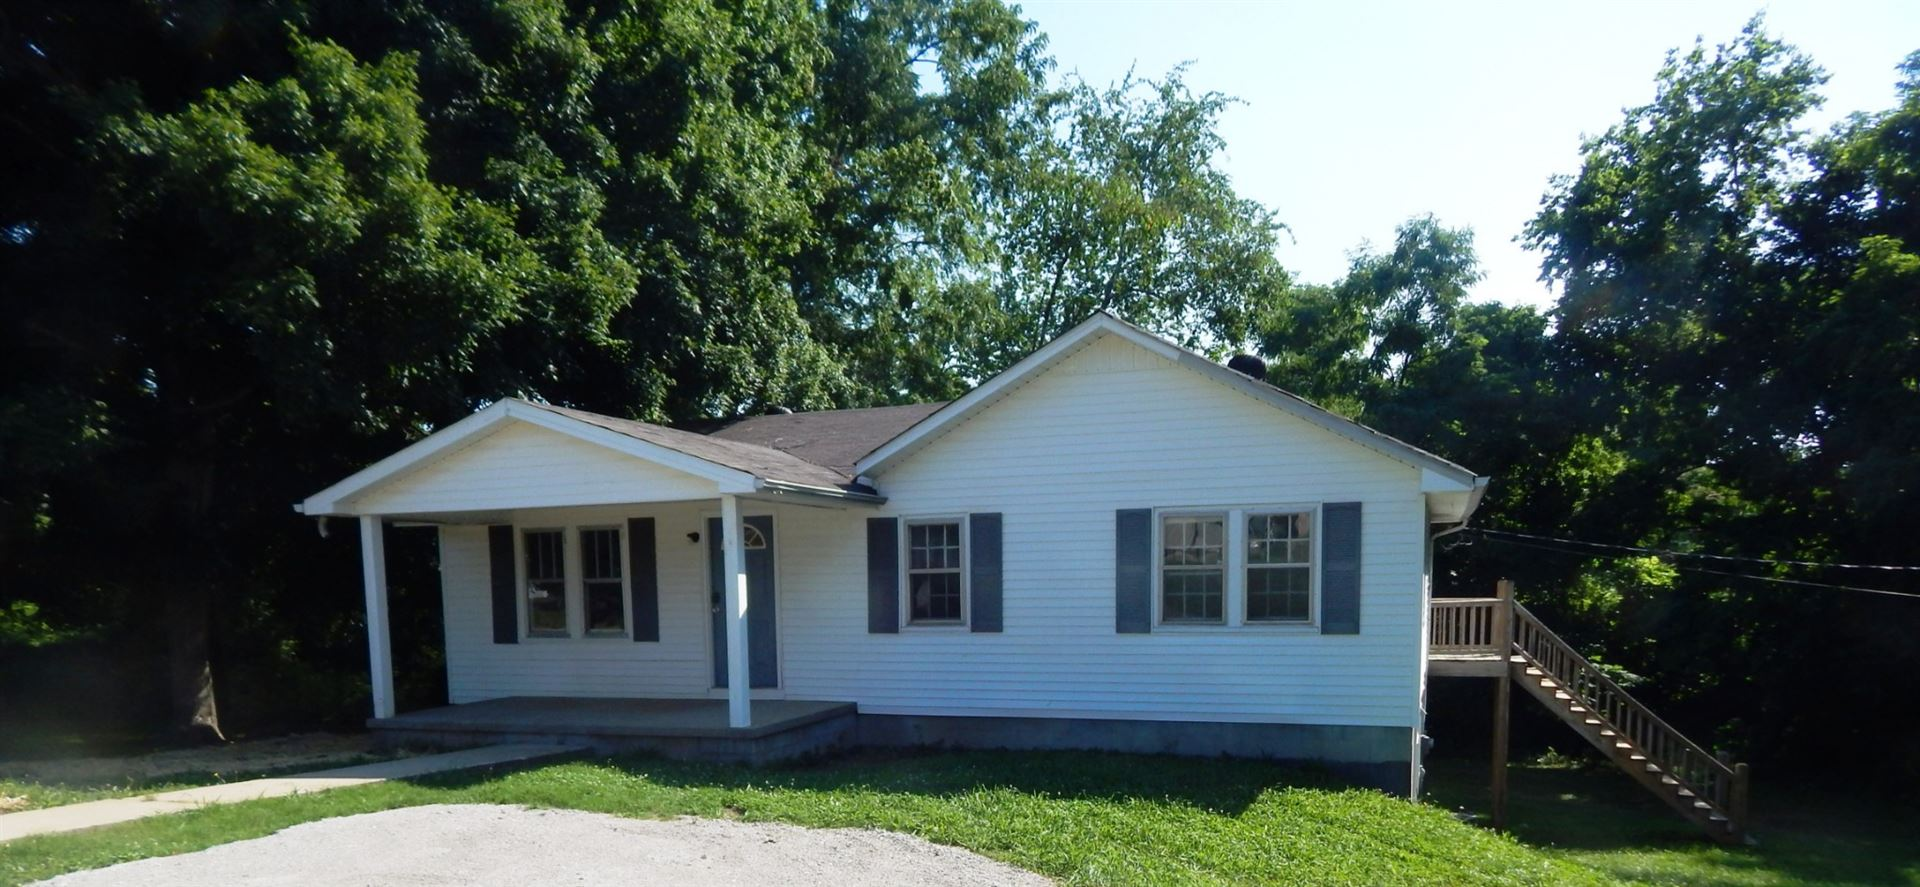 101 West Hunt Street, Dickson, TN 37055 - MLS#: 2264132